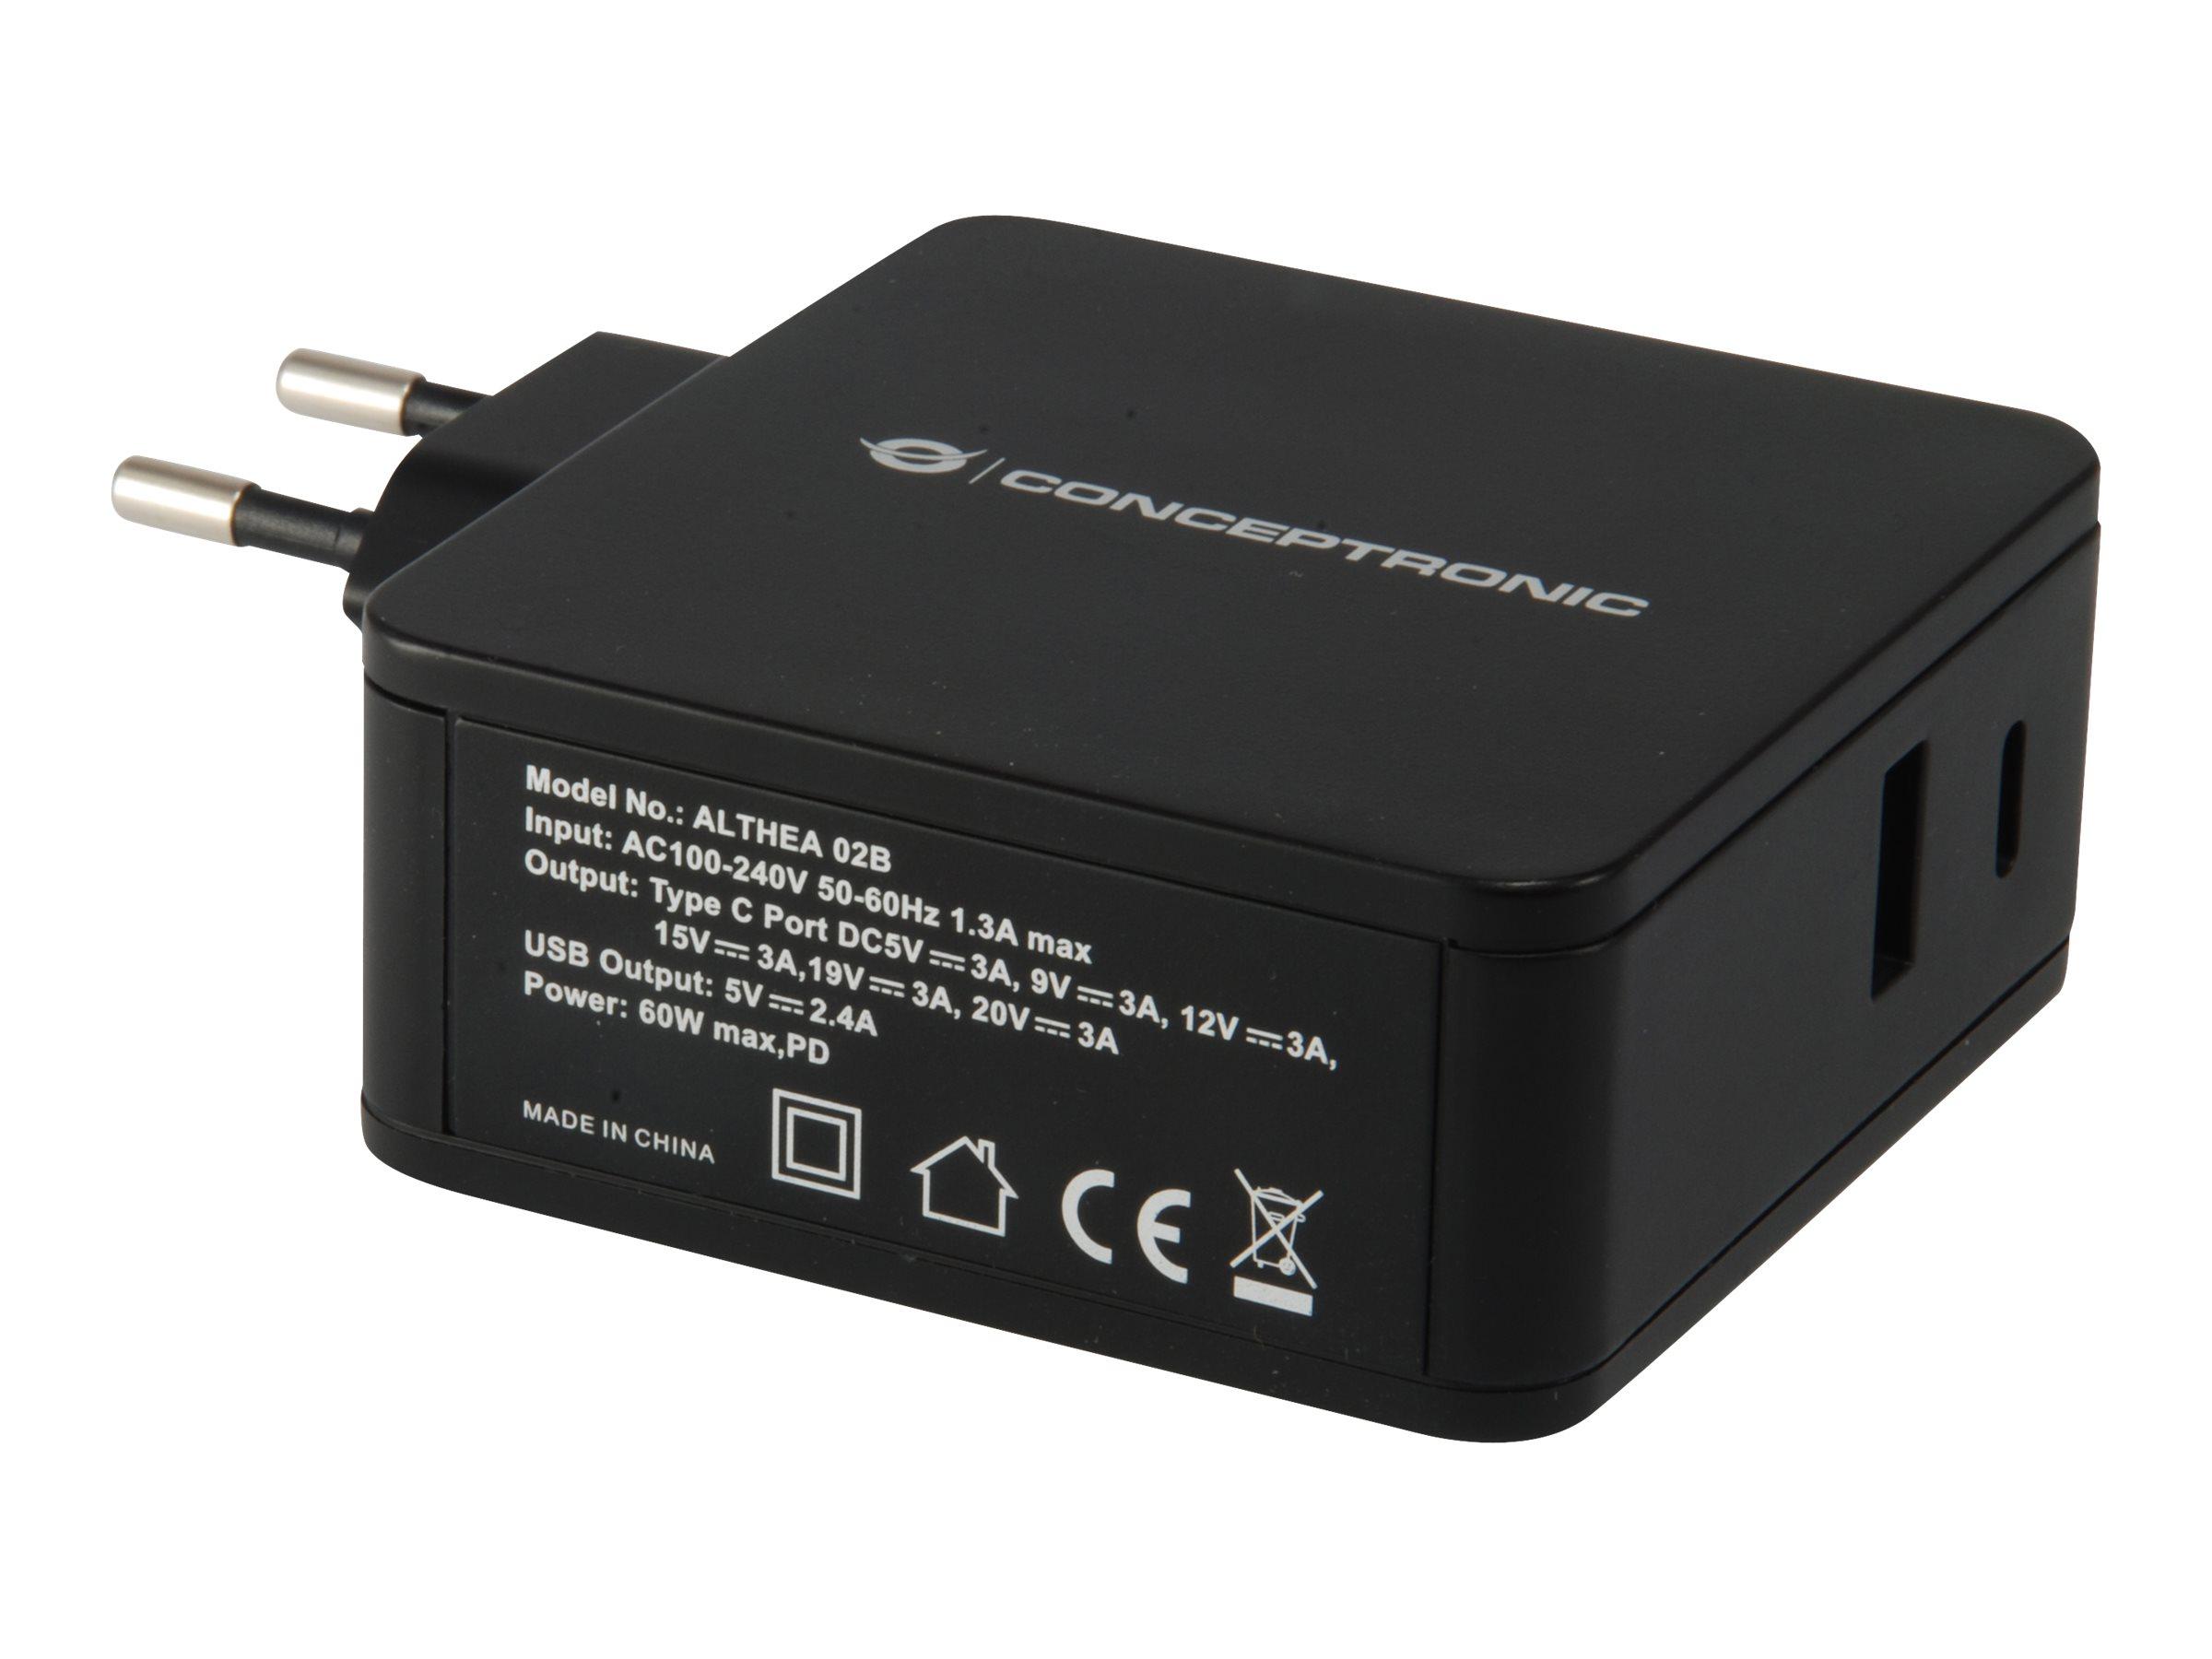 Conceptronic ALTHEA 02B 2-Port 60W USB PD Charger - Netzteil - 60 Watt - 3 A (USB, USB-C)